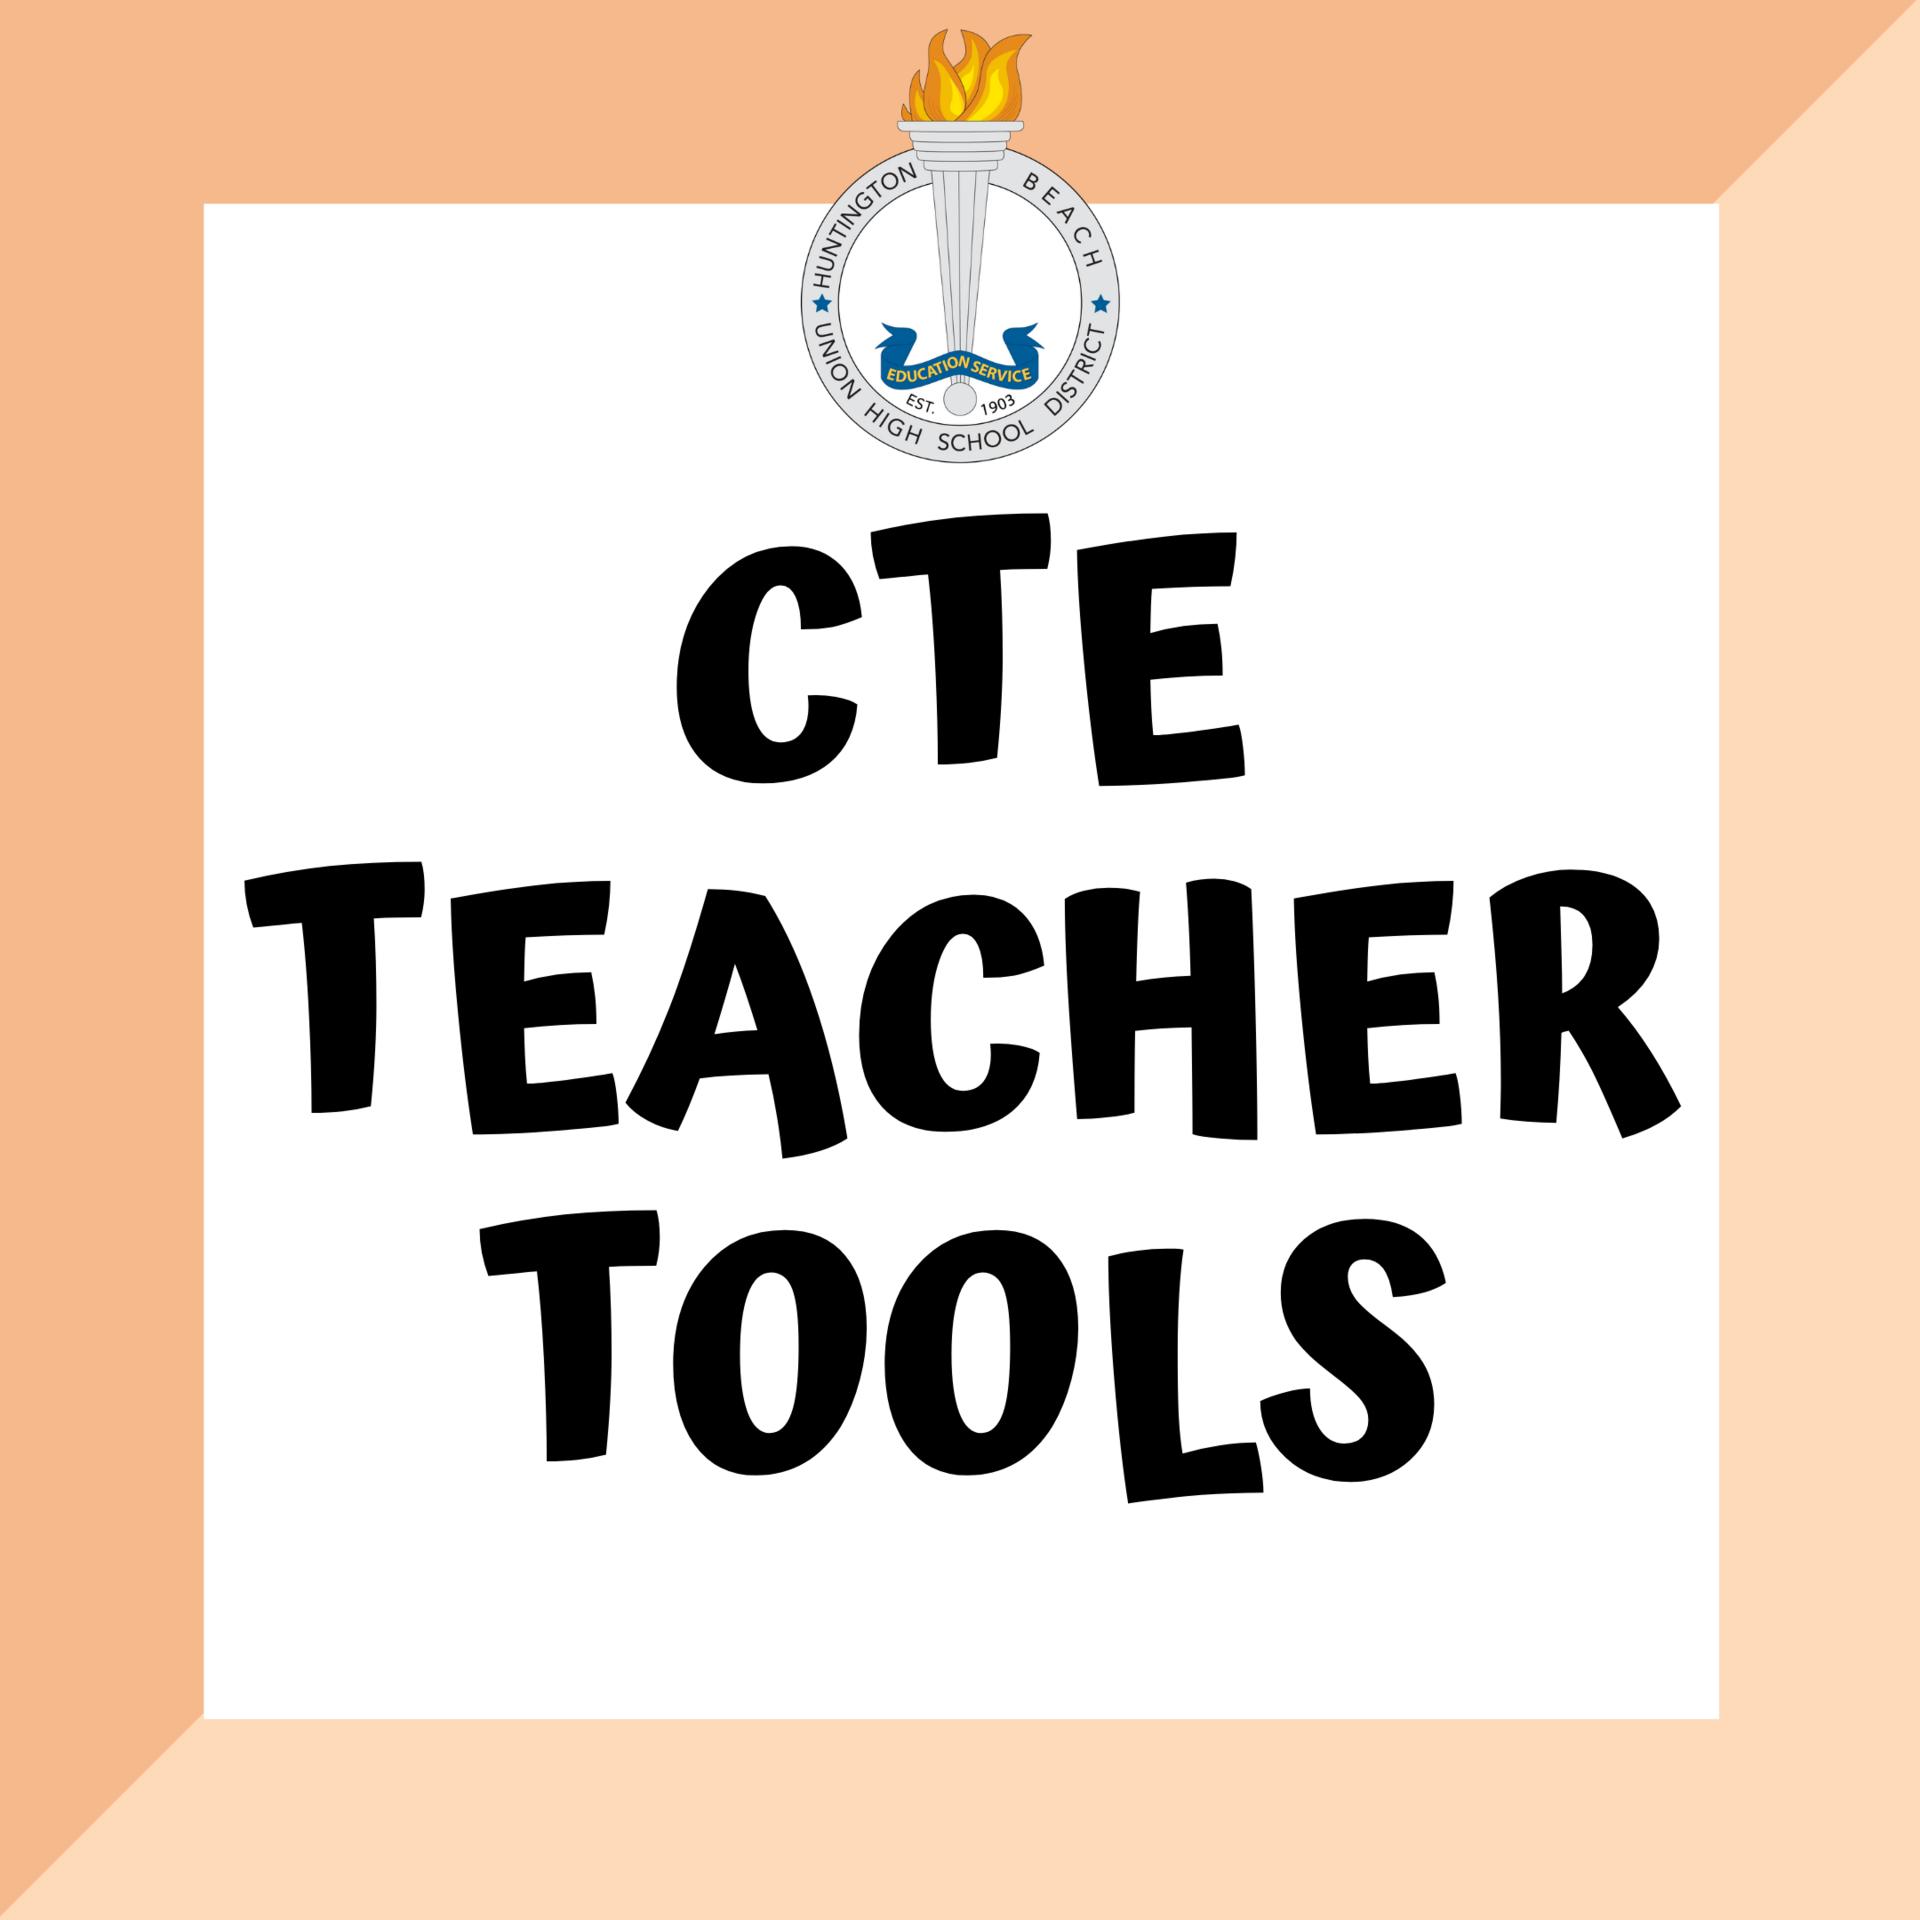 cte teacher tools